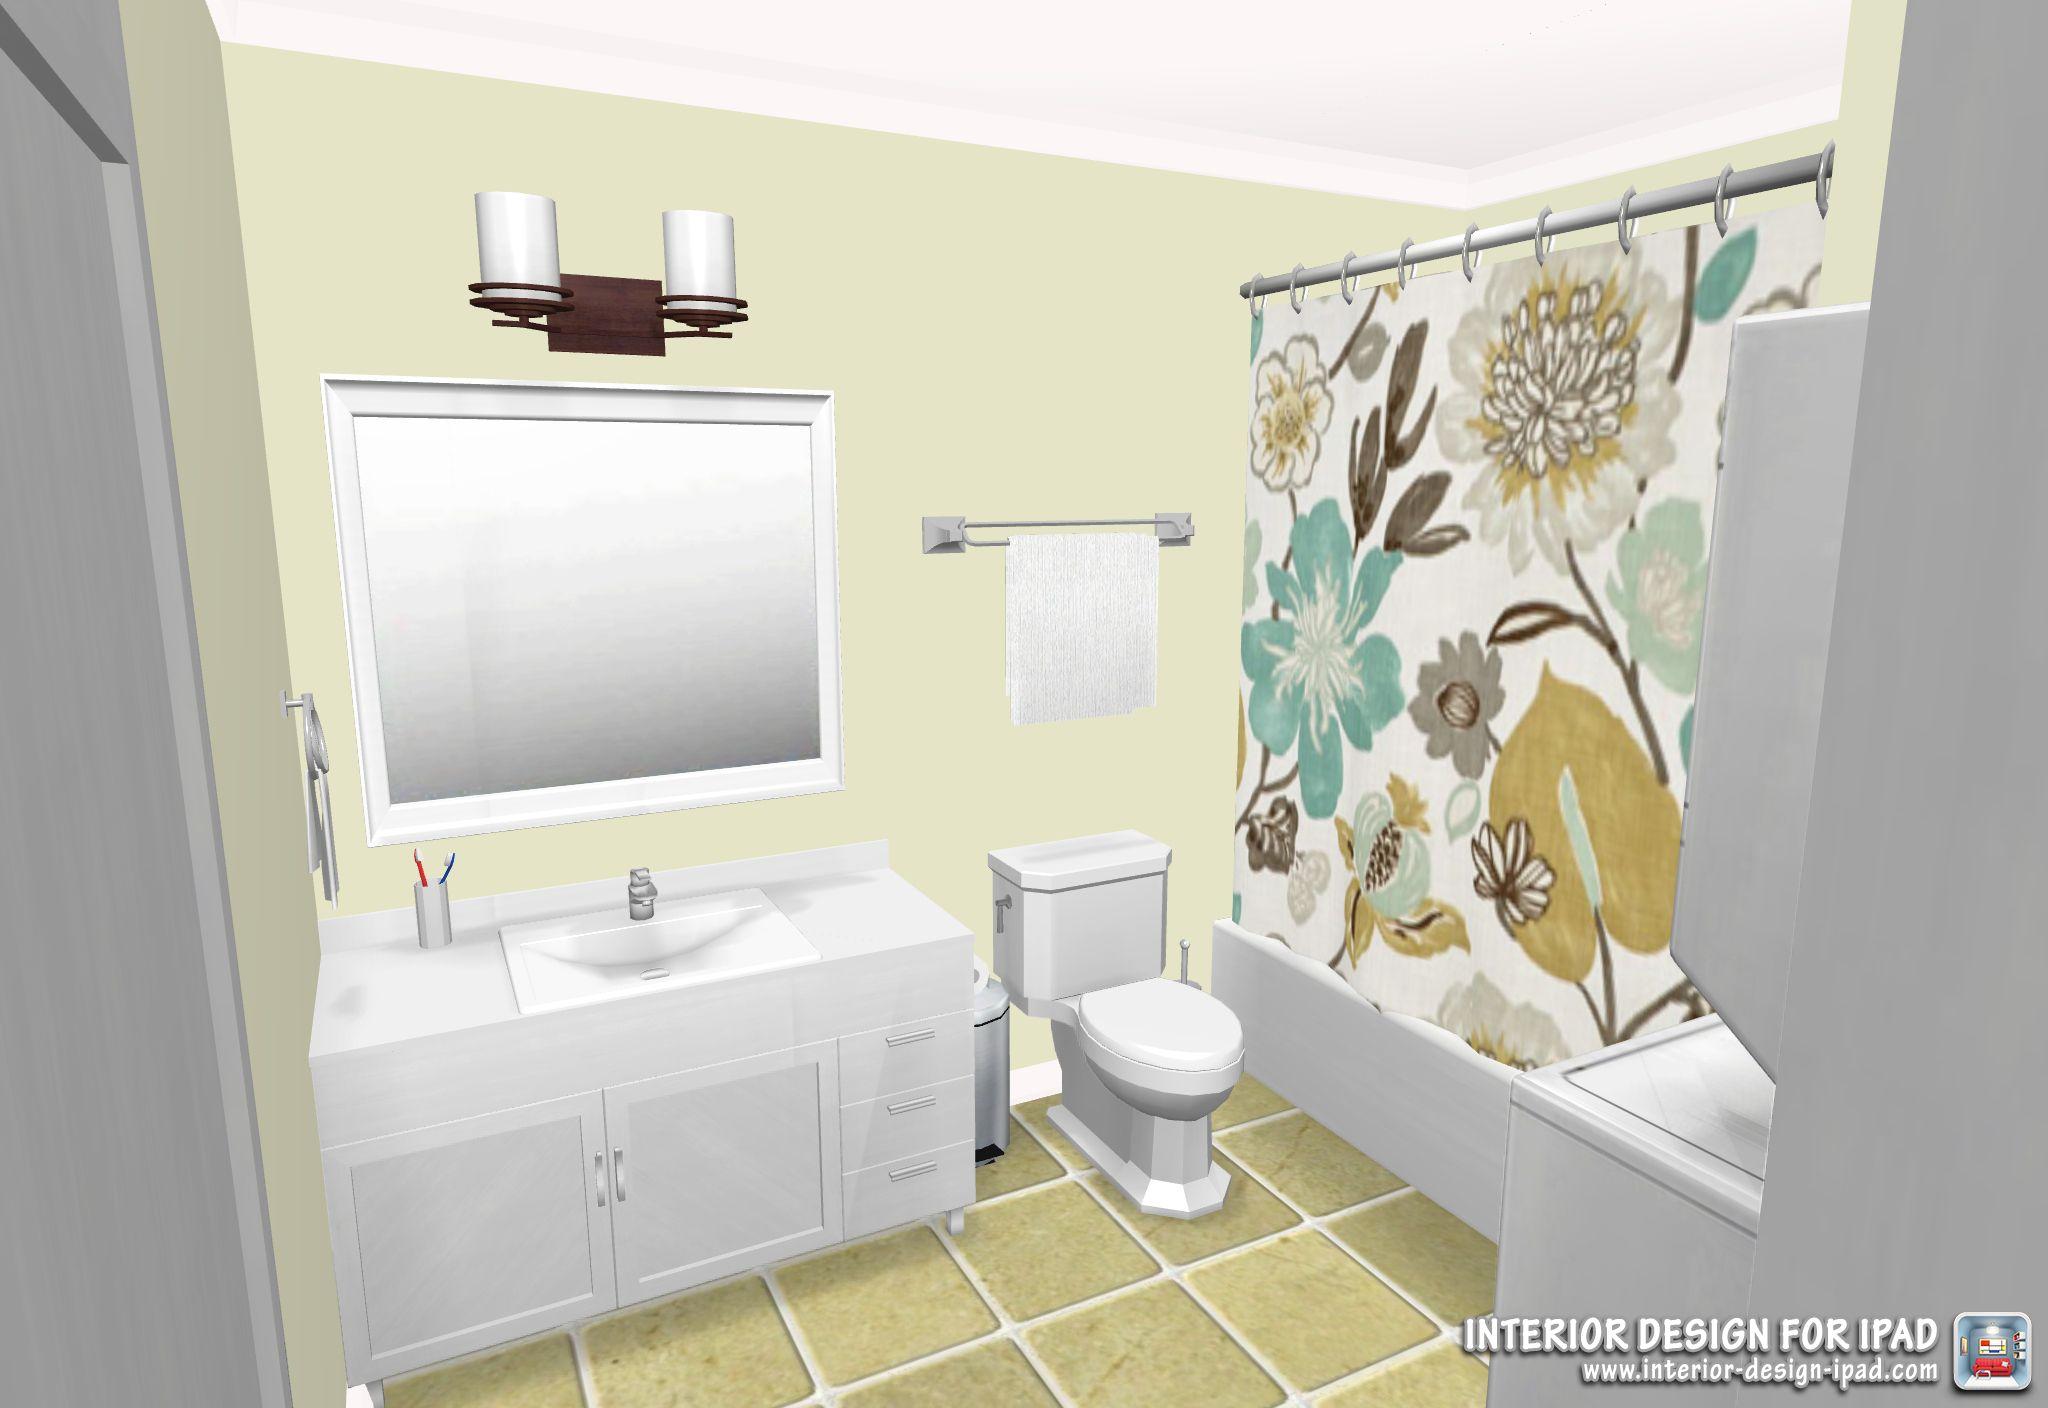 Bathroom Created By Interior Design For Ipad App Interior